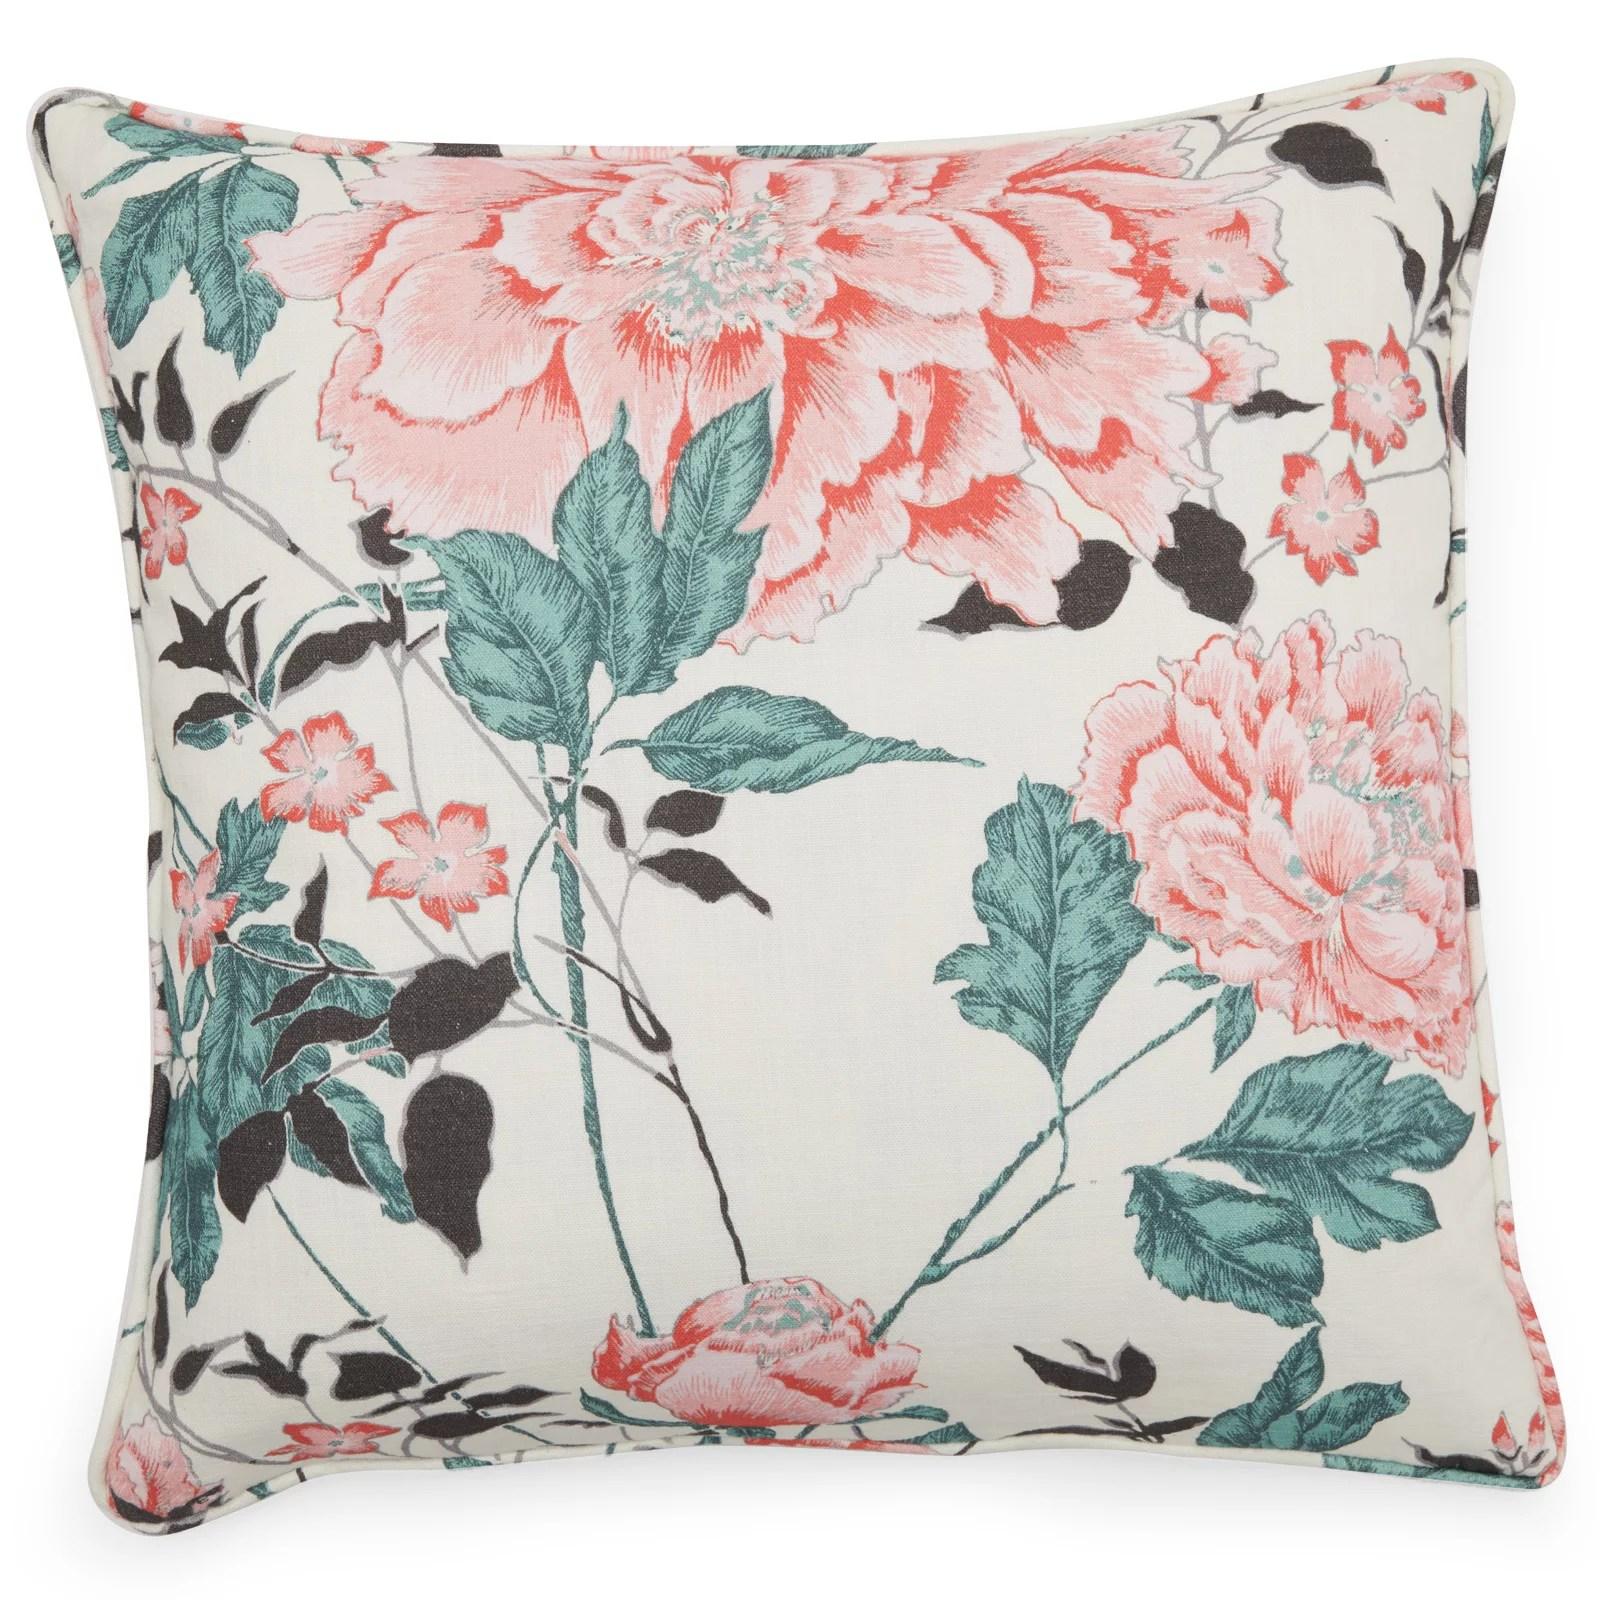 vintage floral decorative pillow cover 20 x 20 by drew barrymore flower home walmart com